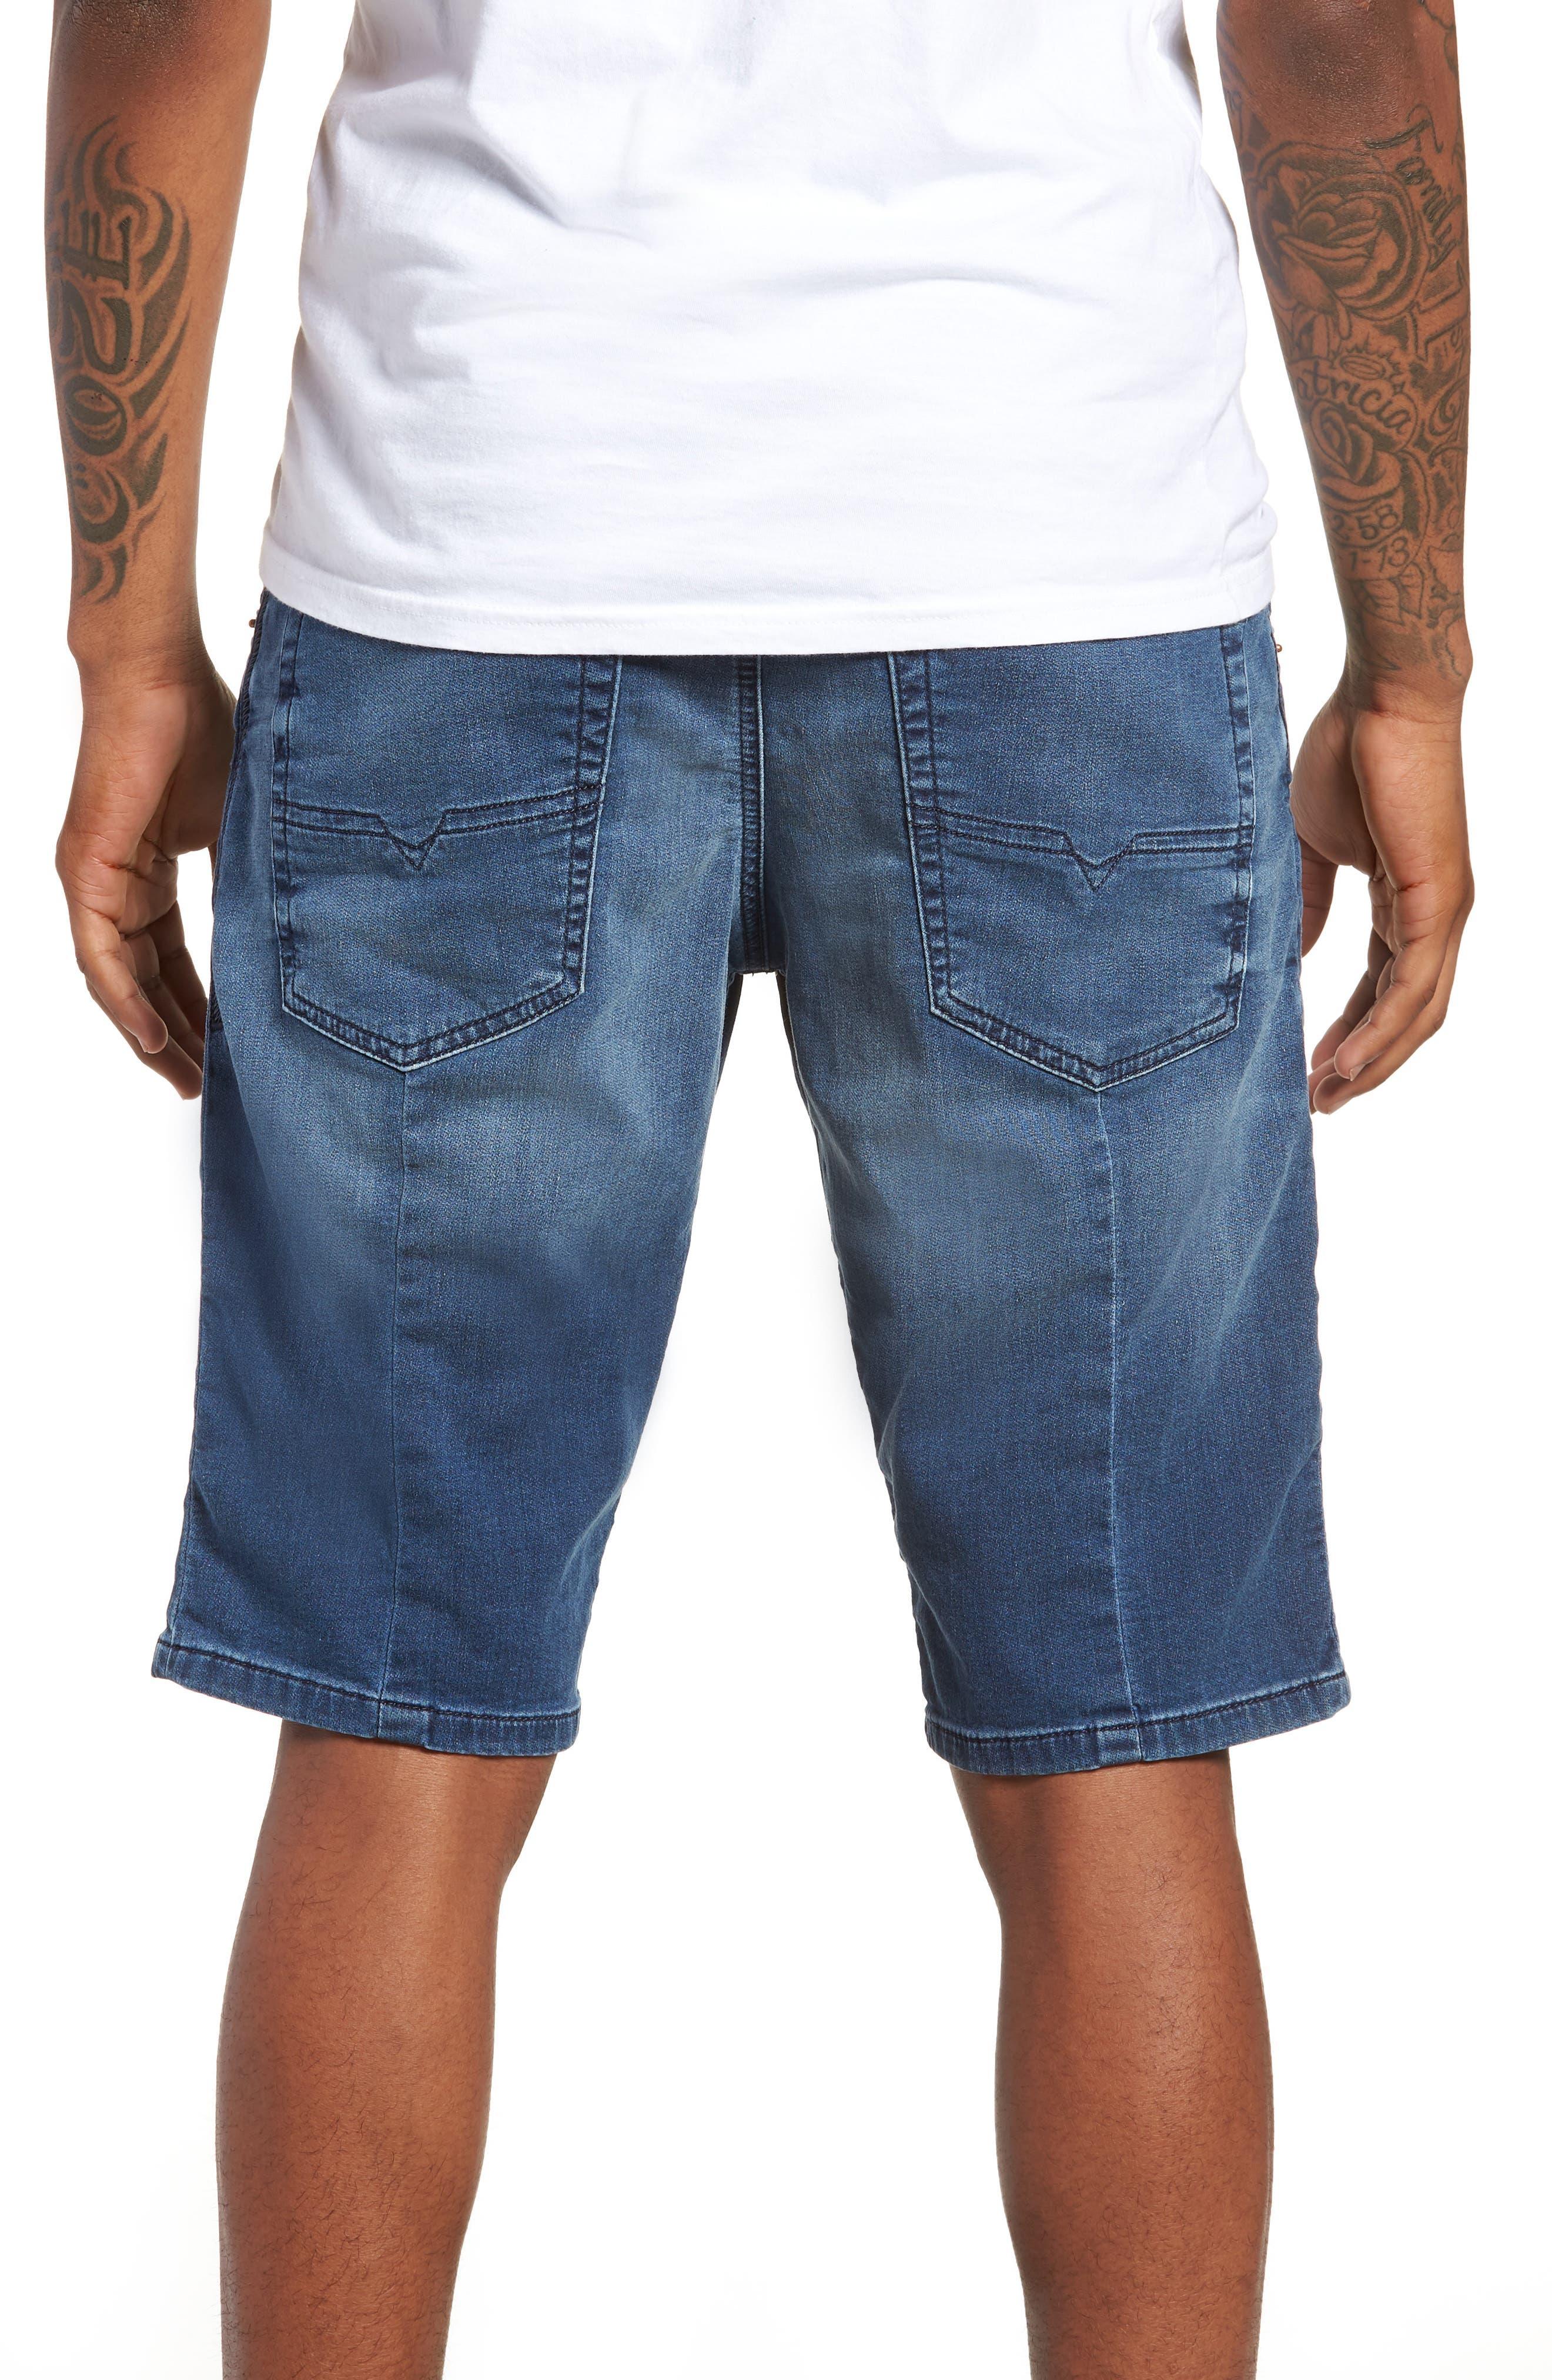 Krooshort Denim Shorts,                             Alternate thumbnail 2, color,                             0687C